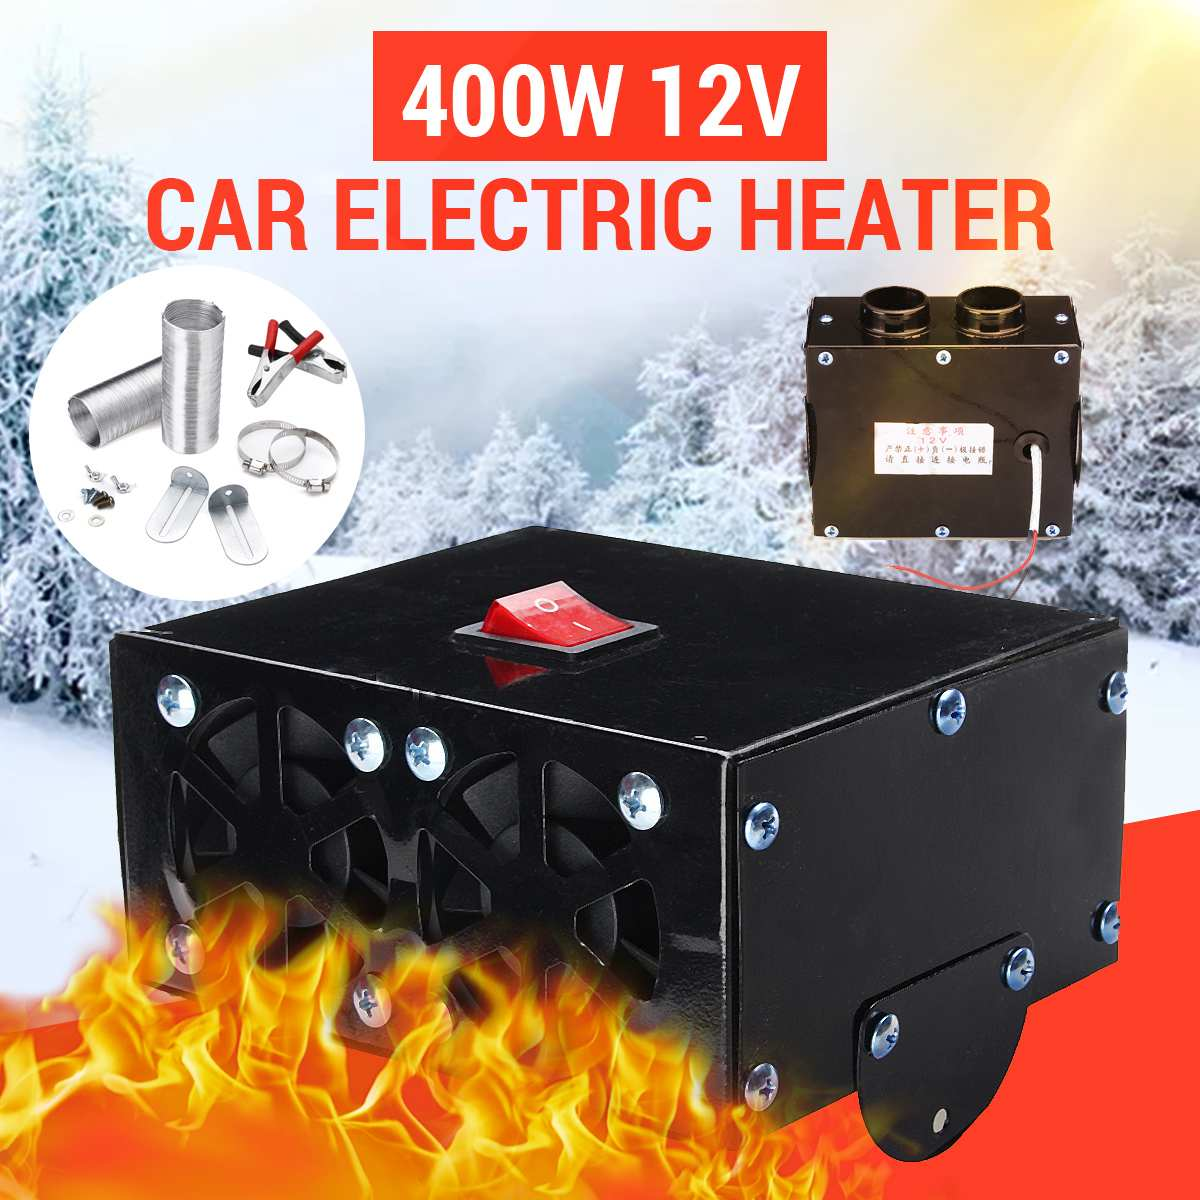 400 W 12V Car Vehicle Fan Heater Defroster Demister Hot Heating Warmer